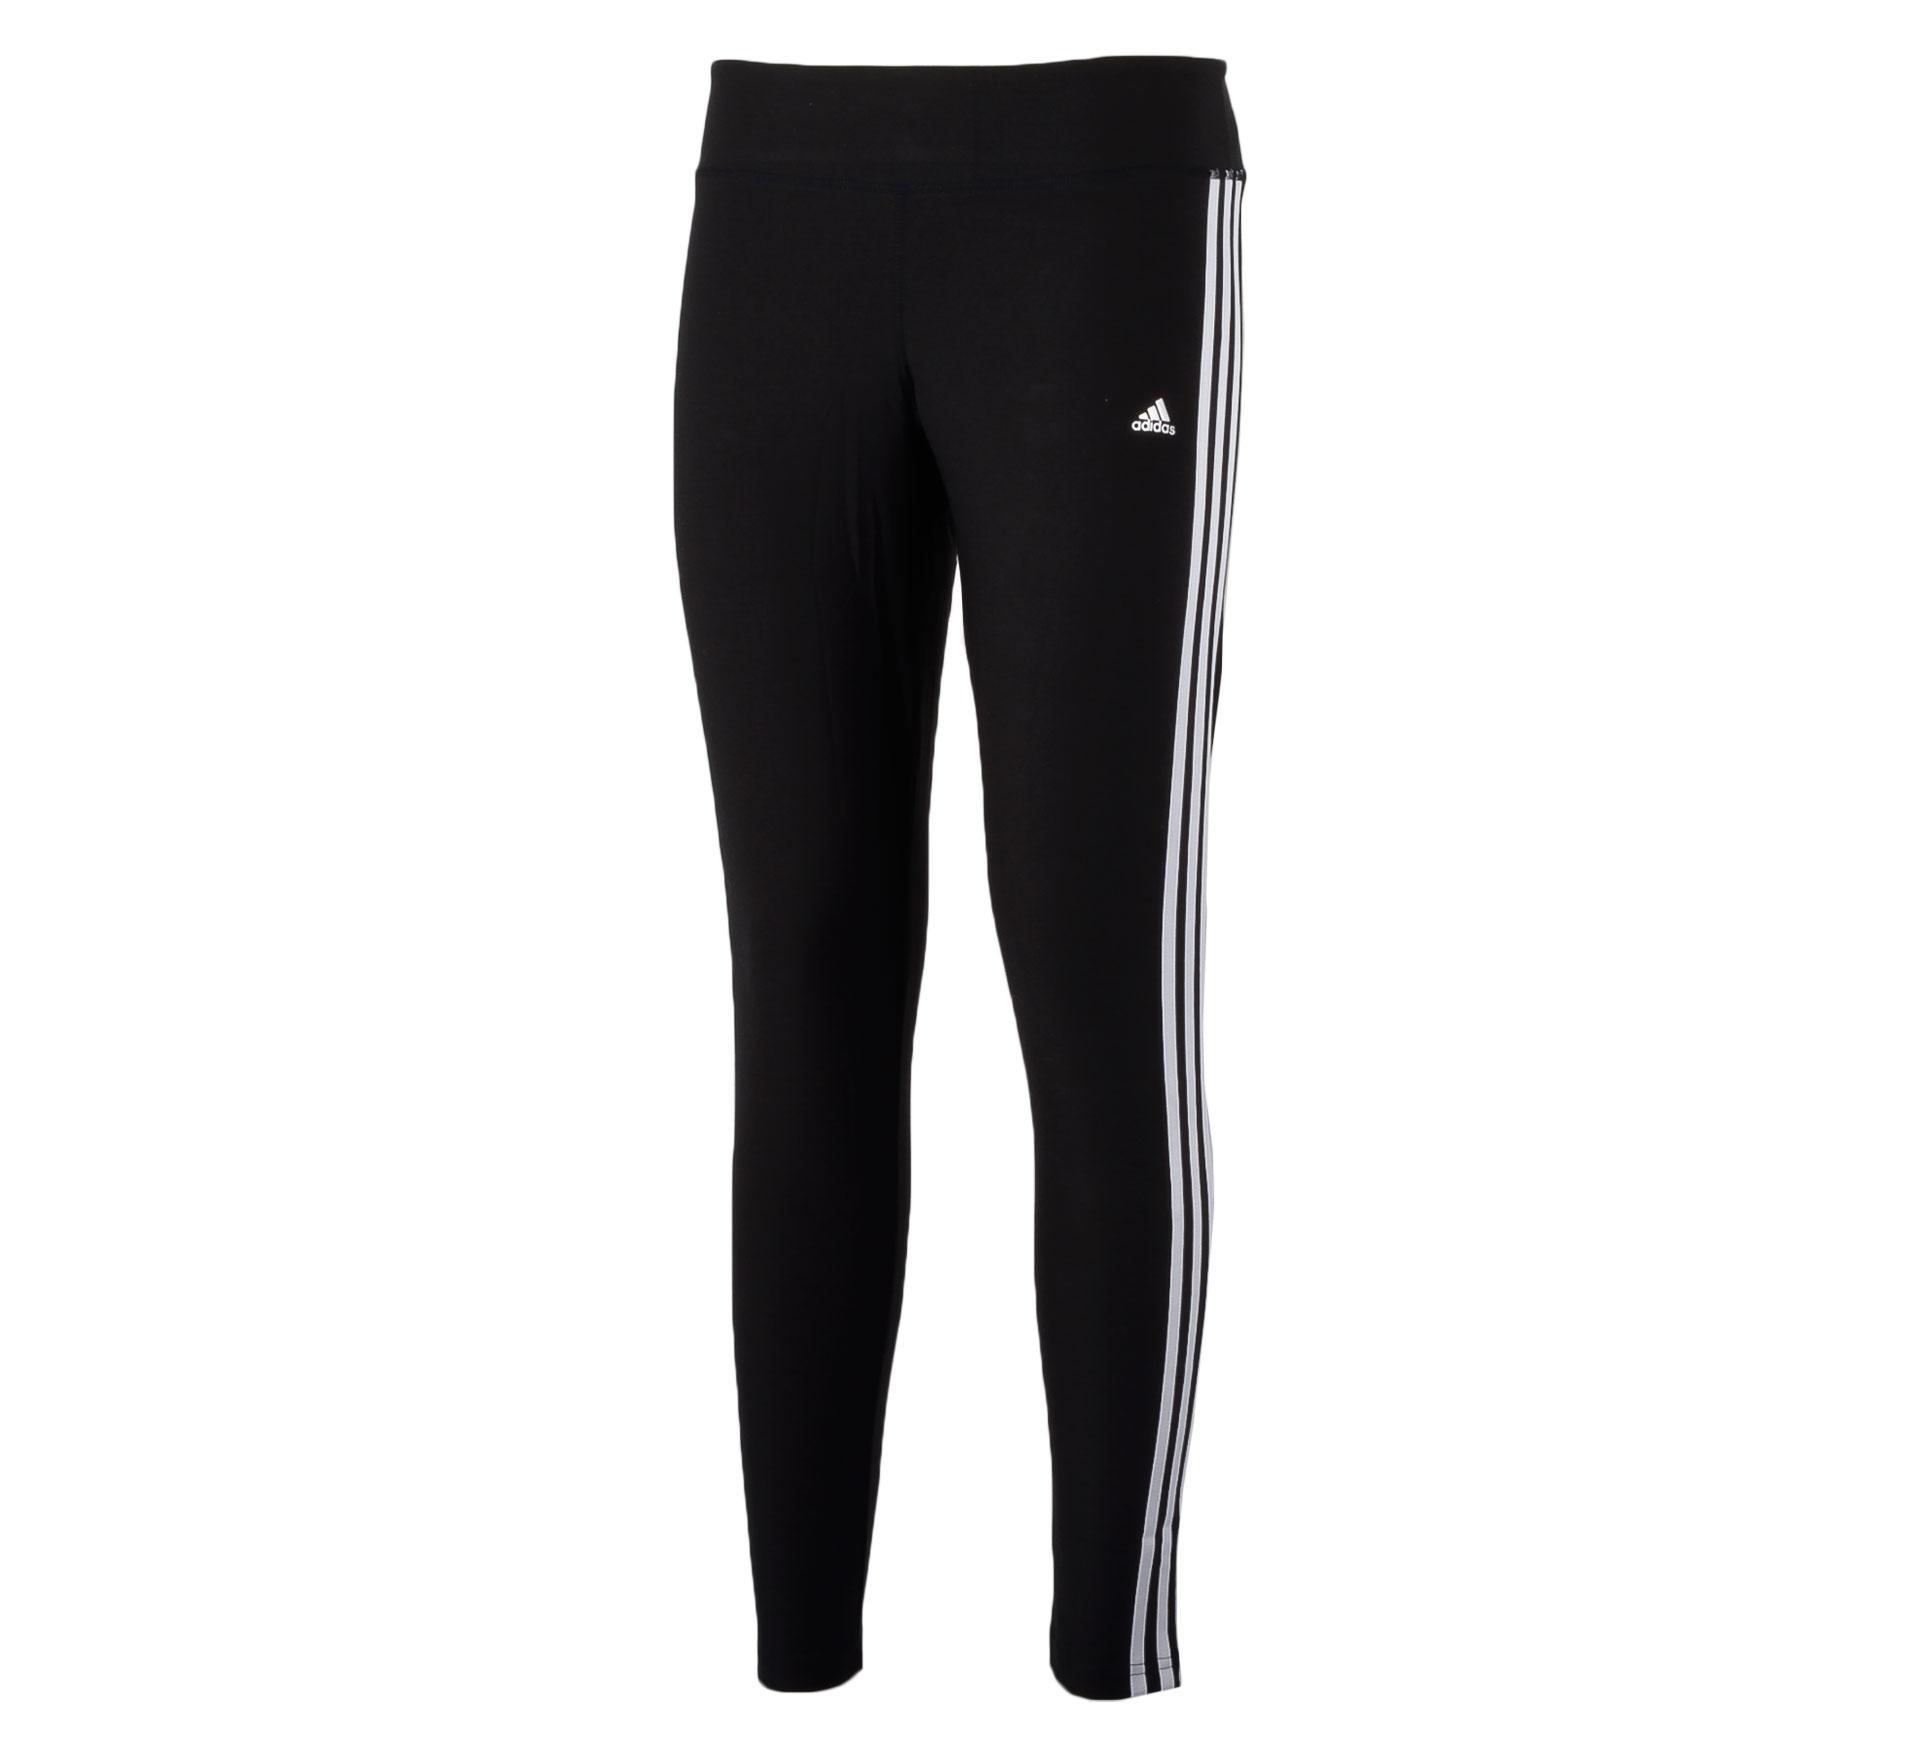 Adidas Ultimate Fit 3Stripe Tight Dames zwart - wit